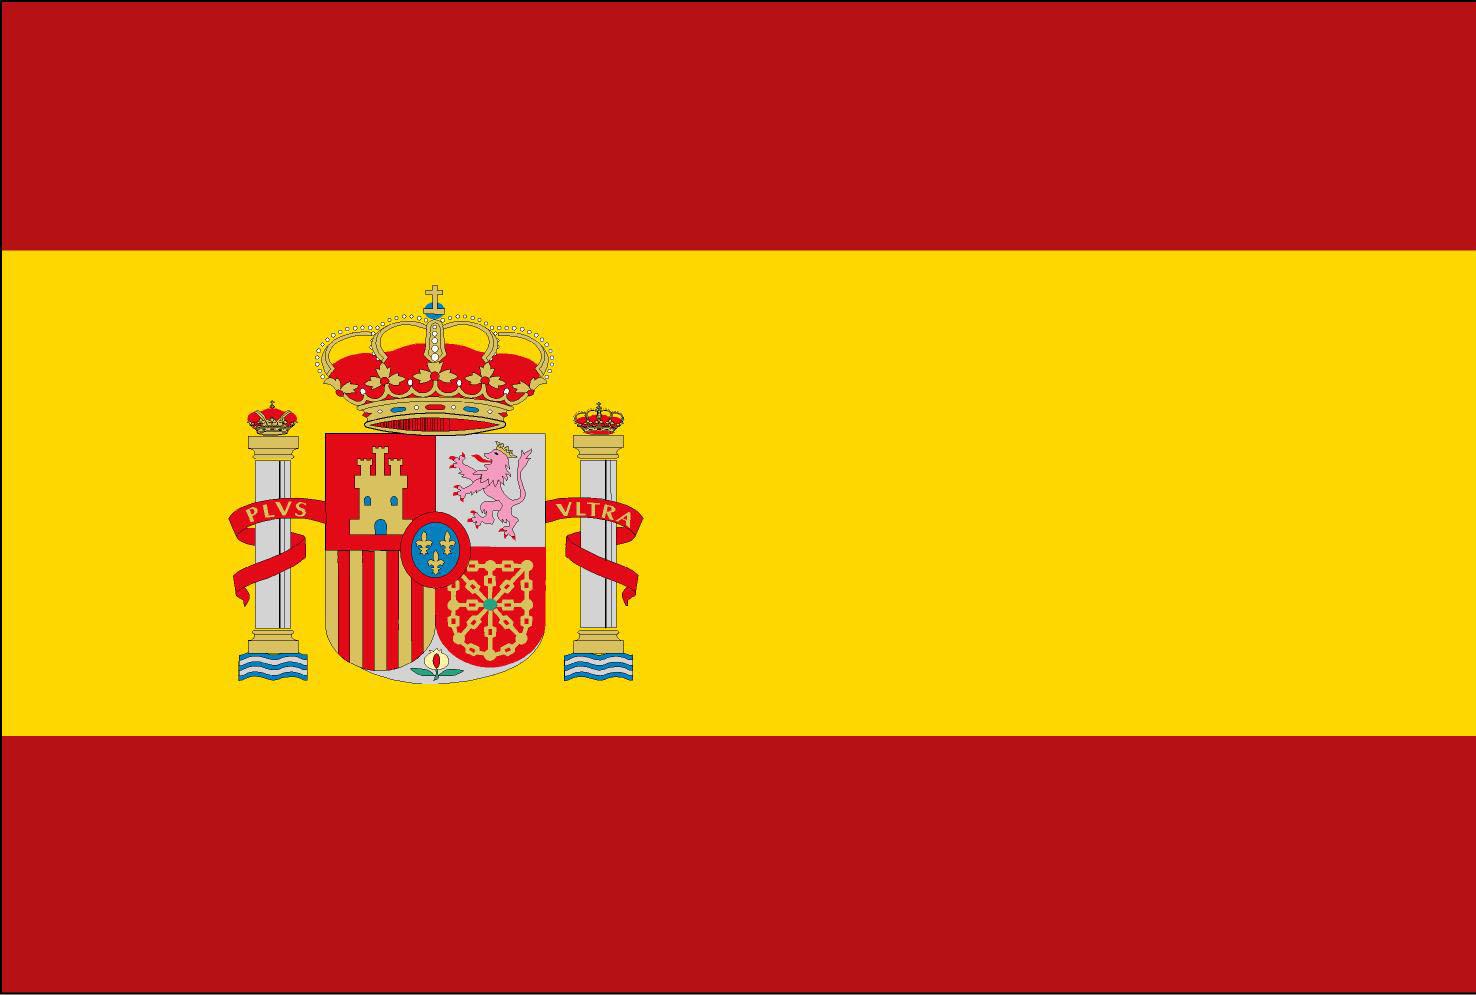 http://2.bp.blogspot.com/_EkYKNbXIgZI/TBkVKT7pygI/AAAAAAAAAAM/l63i1eUzqns/s1600/espanha.jpg